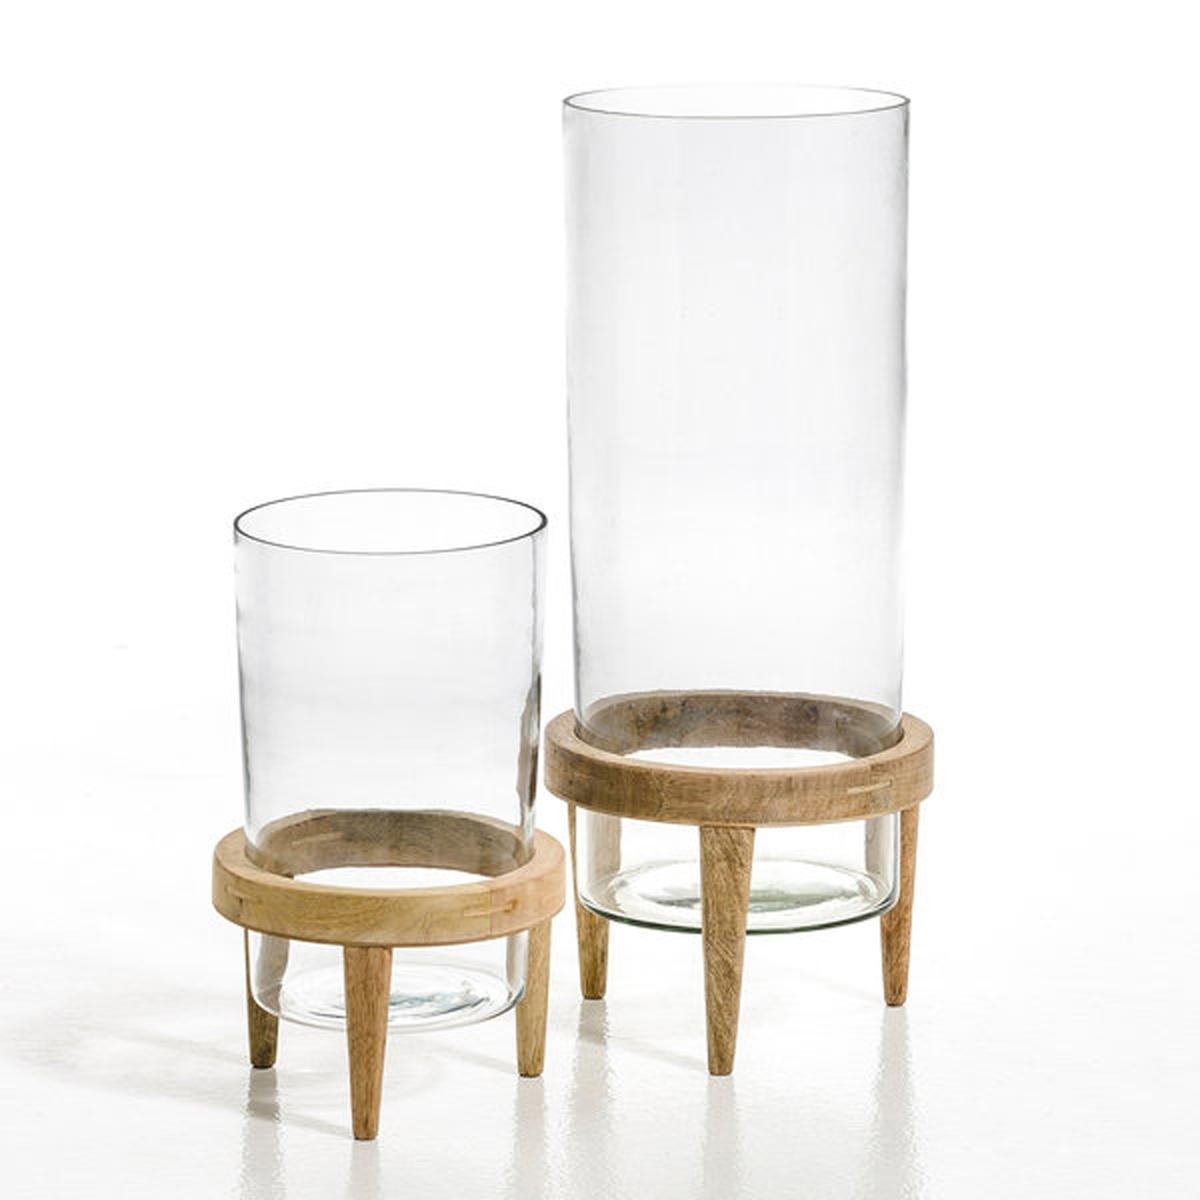 Террариум Bocage из стекла и мангового дерева, диаметр 20 см lancome bocage дезодорант спрей bocage дезодорант спрей